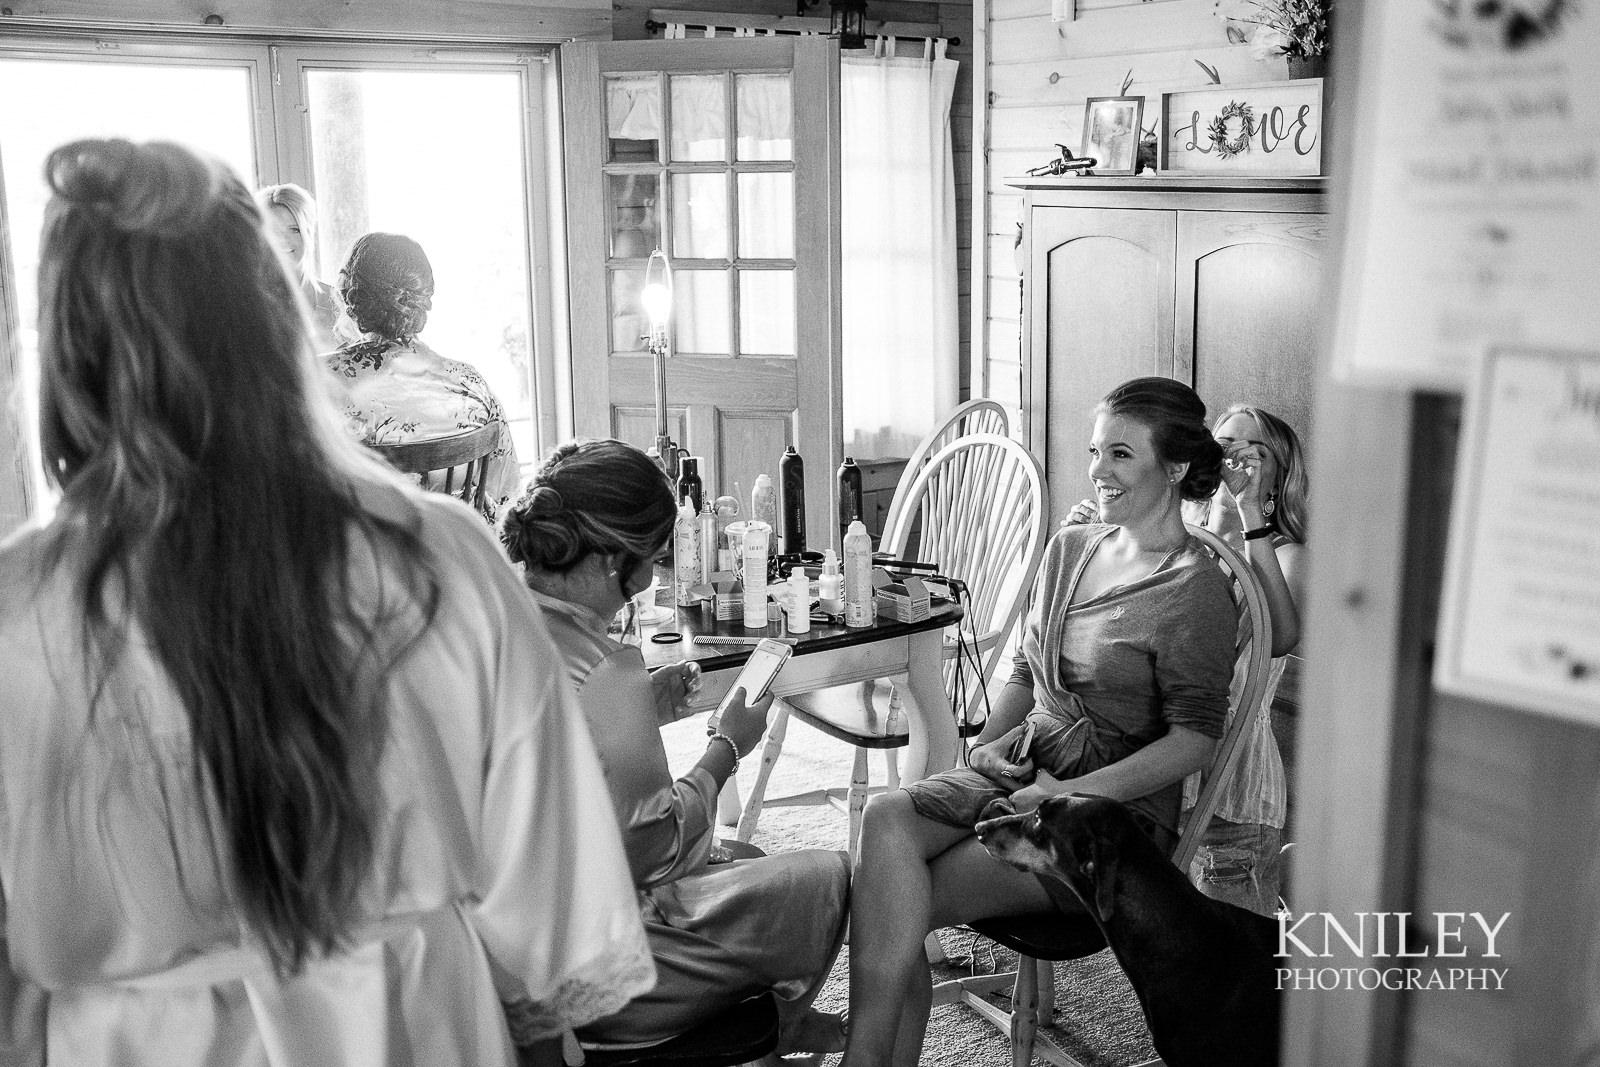 013 - Buffalo NY wedding - Preparation pictures - XT2A6567.jpg